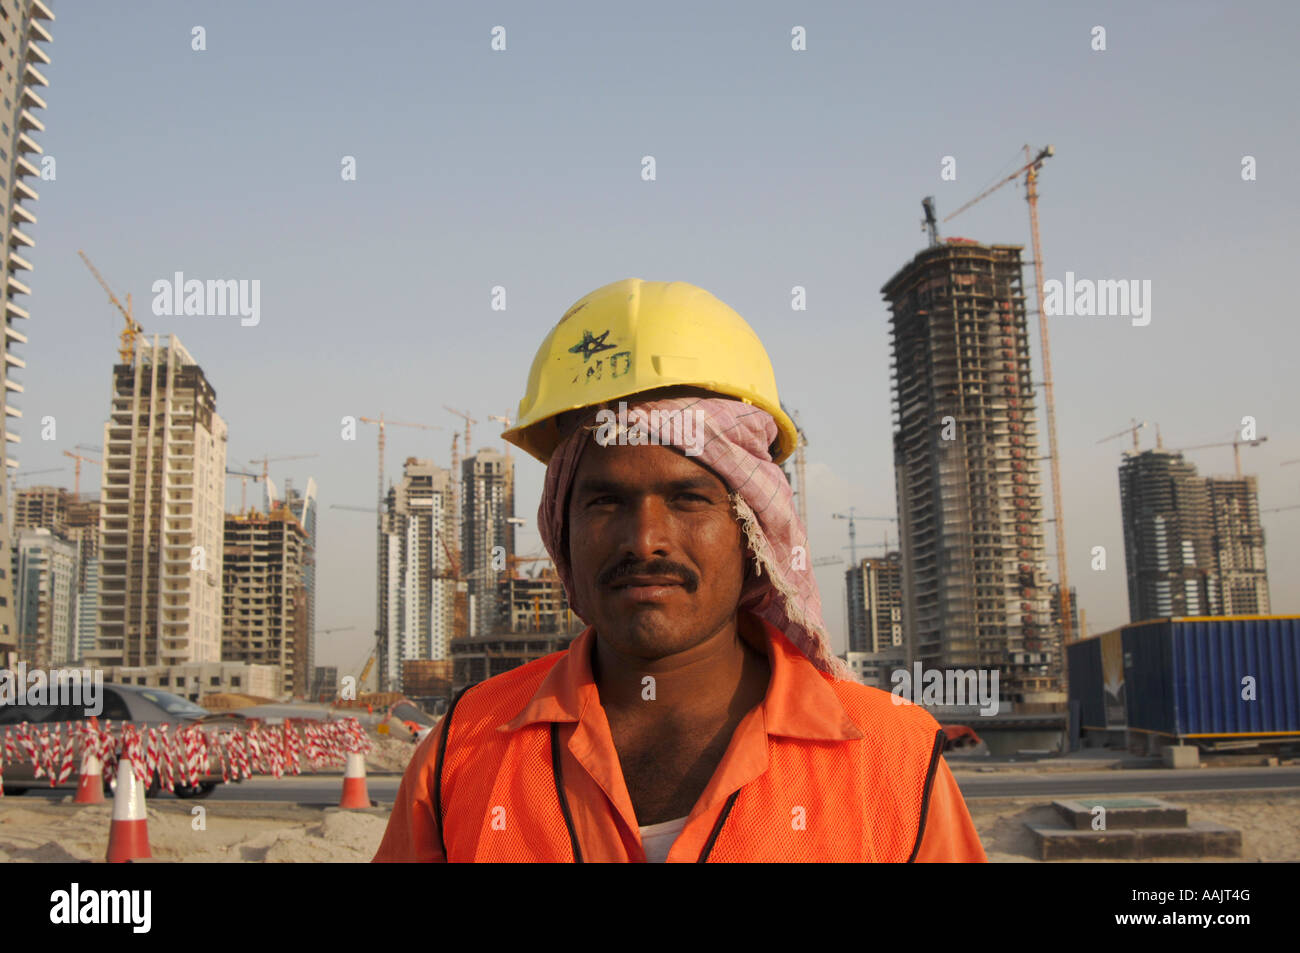 expatriate labour